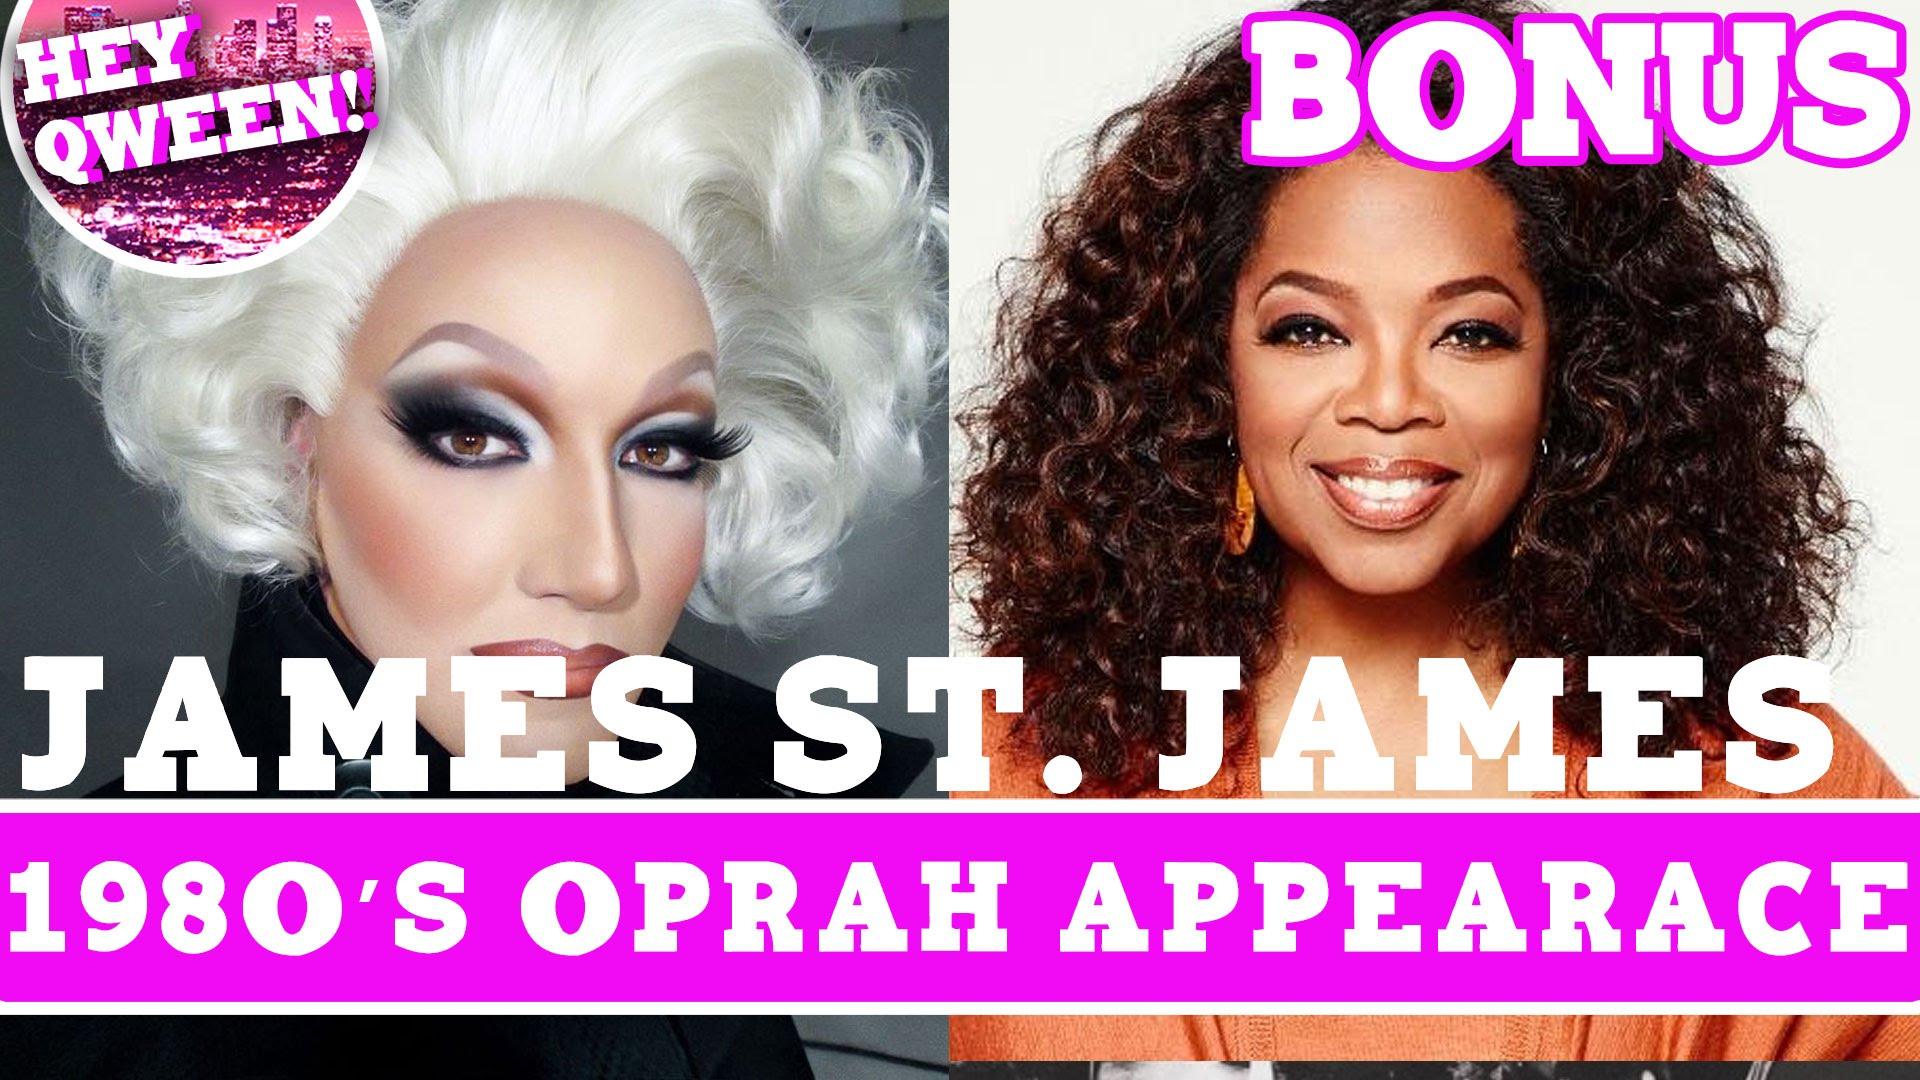 Hey Qween! BONUS: James St James 1980s Oprah Appearance